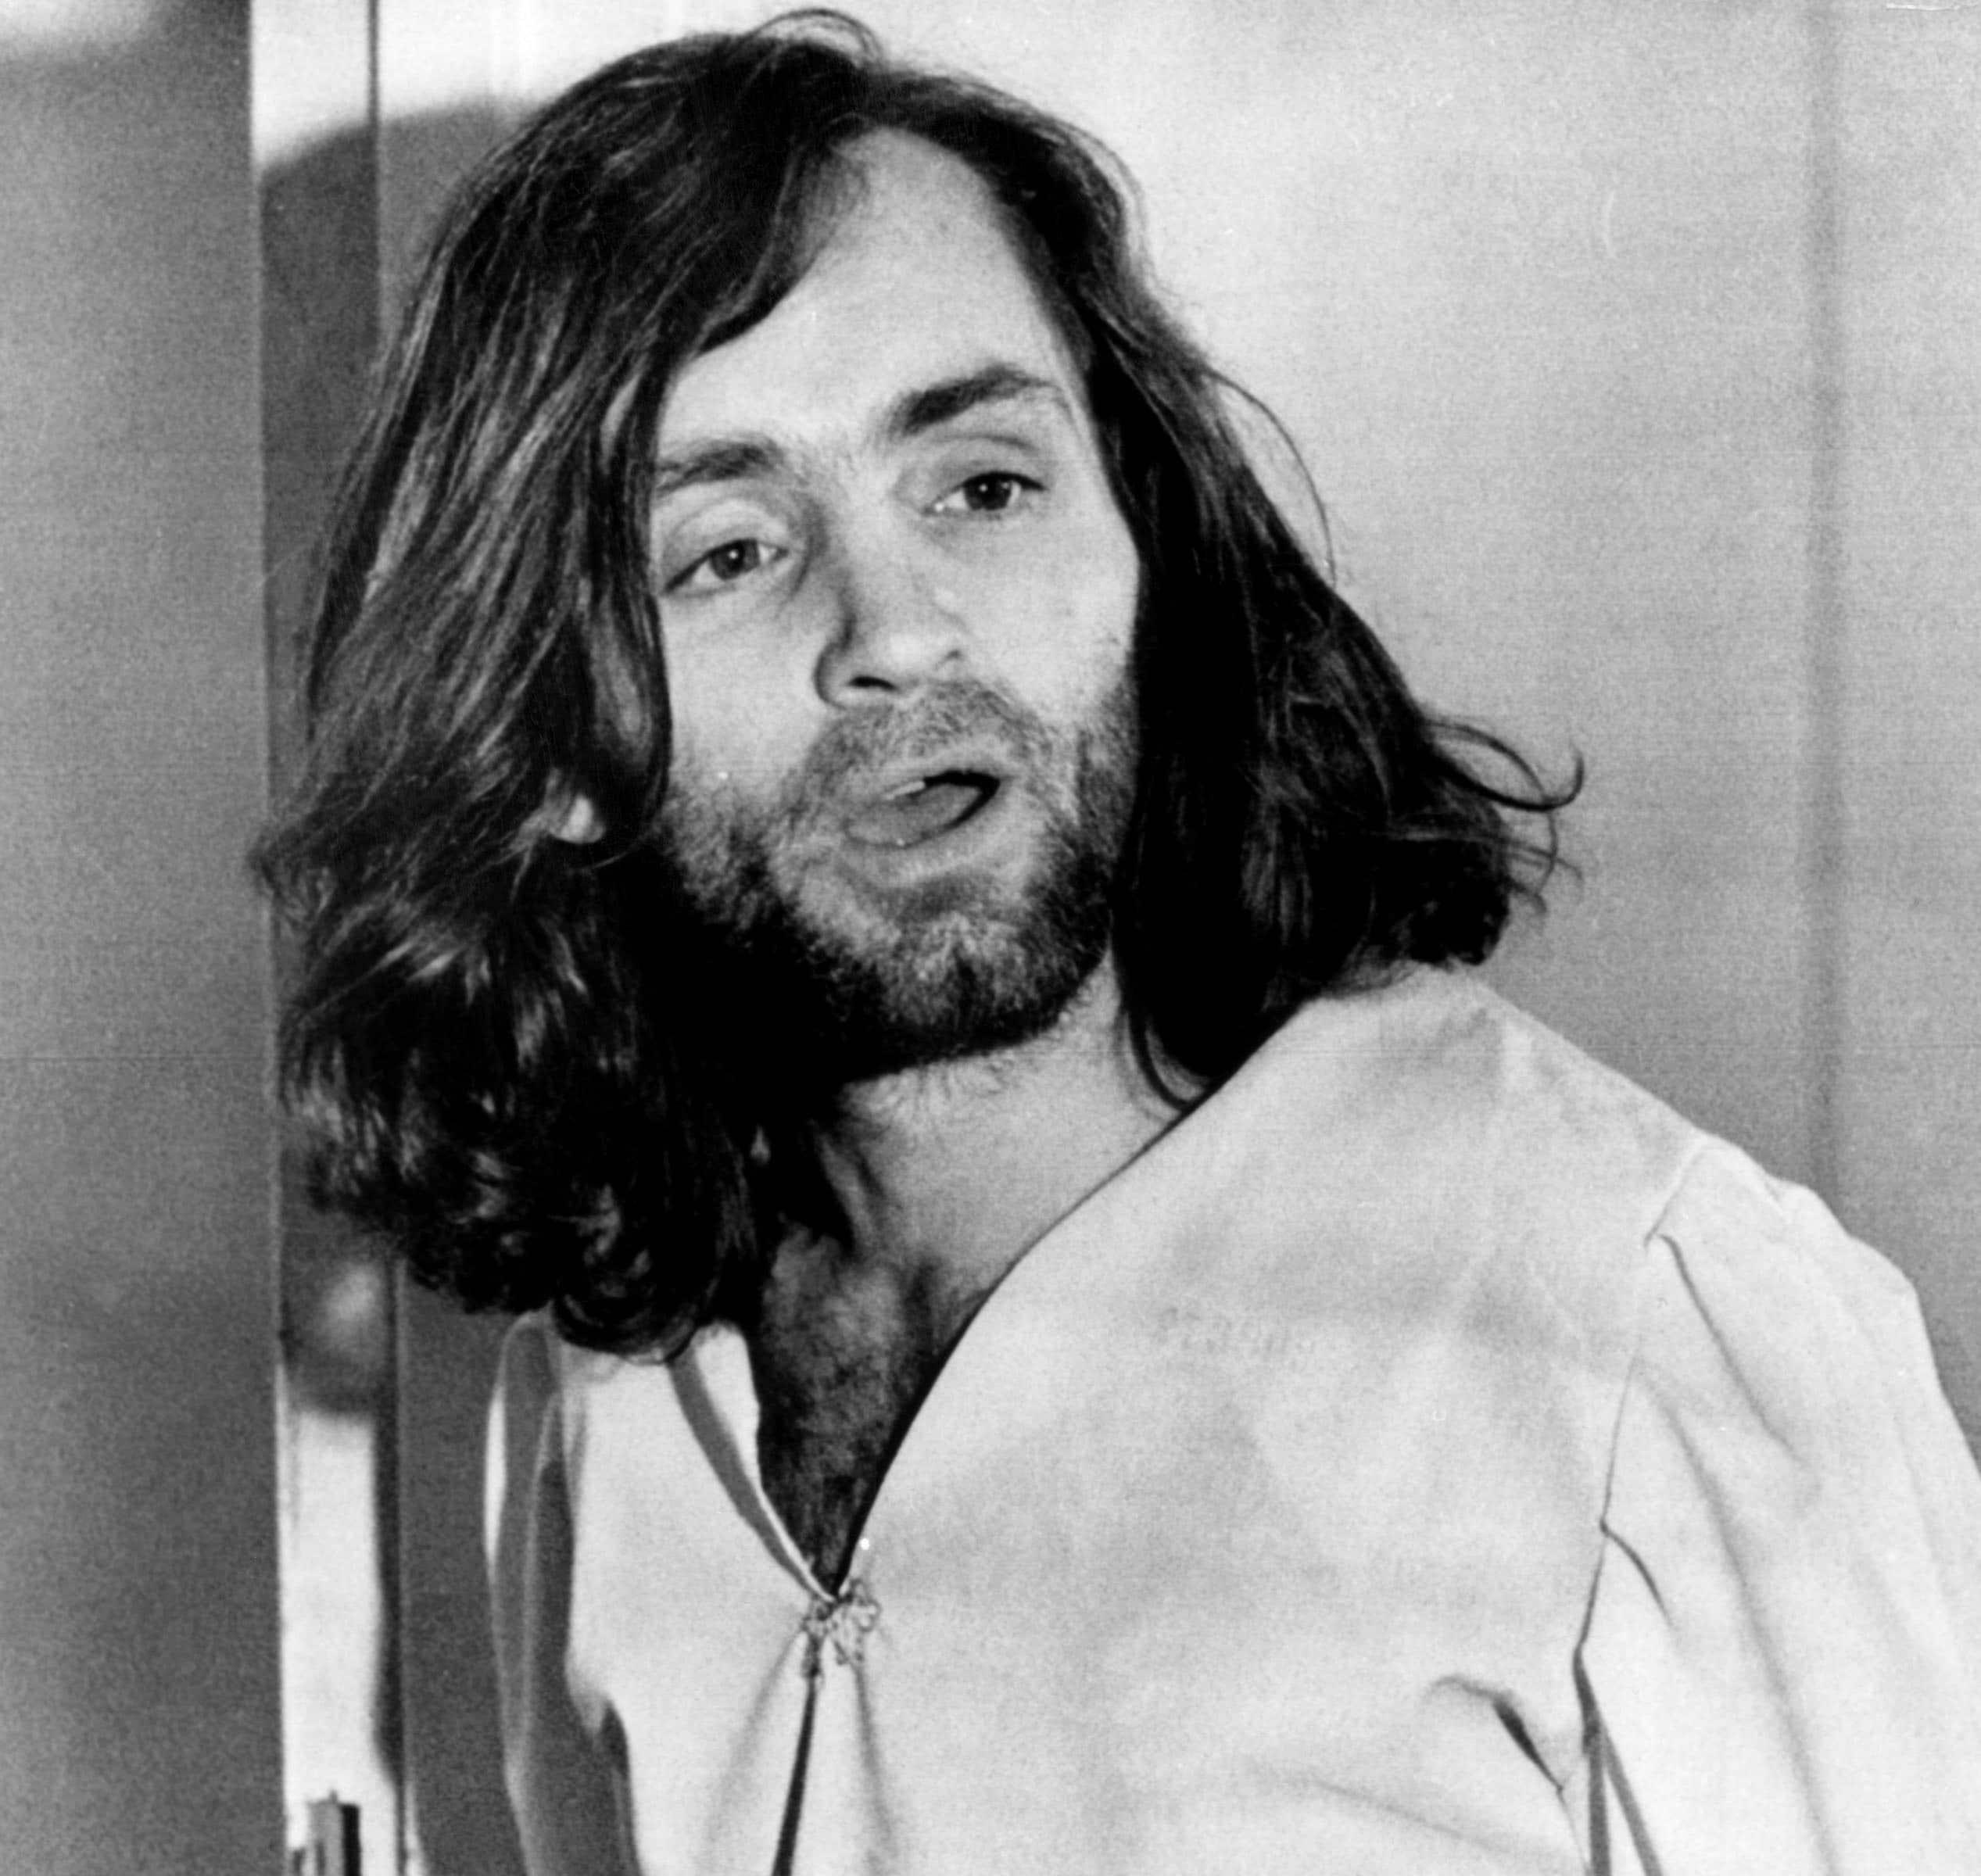 Charles Manson, cult leader